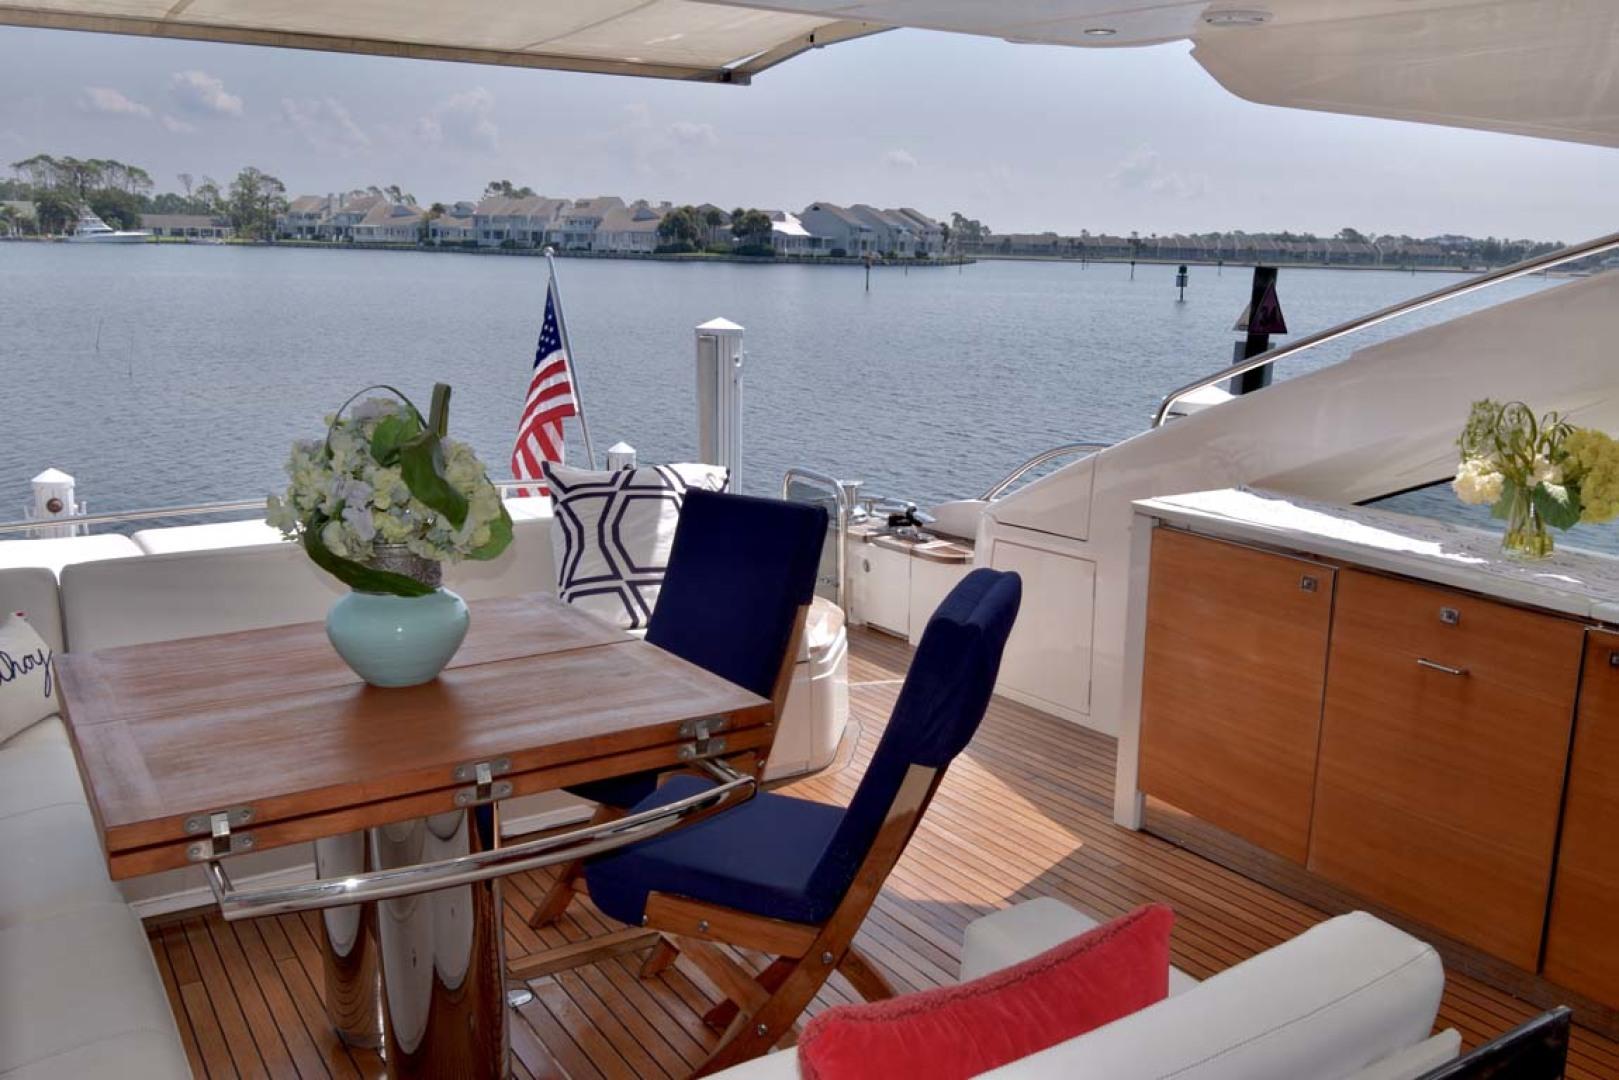 Princess-V72 2013-High Bid Destin-Florida-United States-Cockpit Table-1233094 | Thumbnail